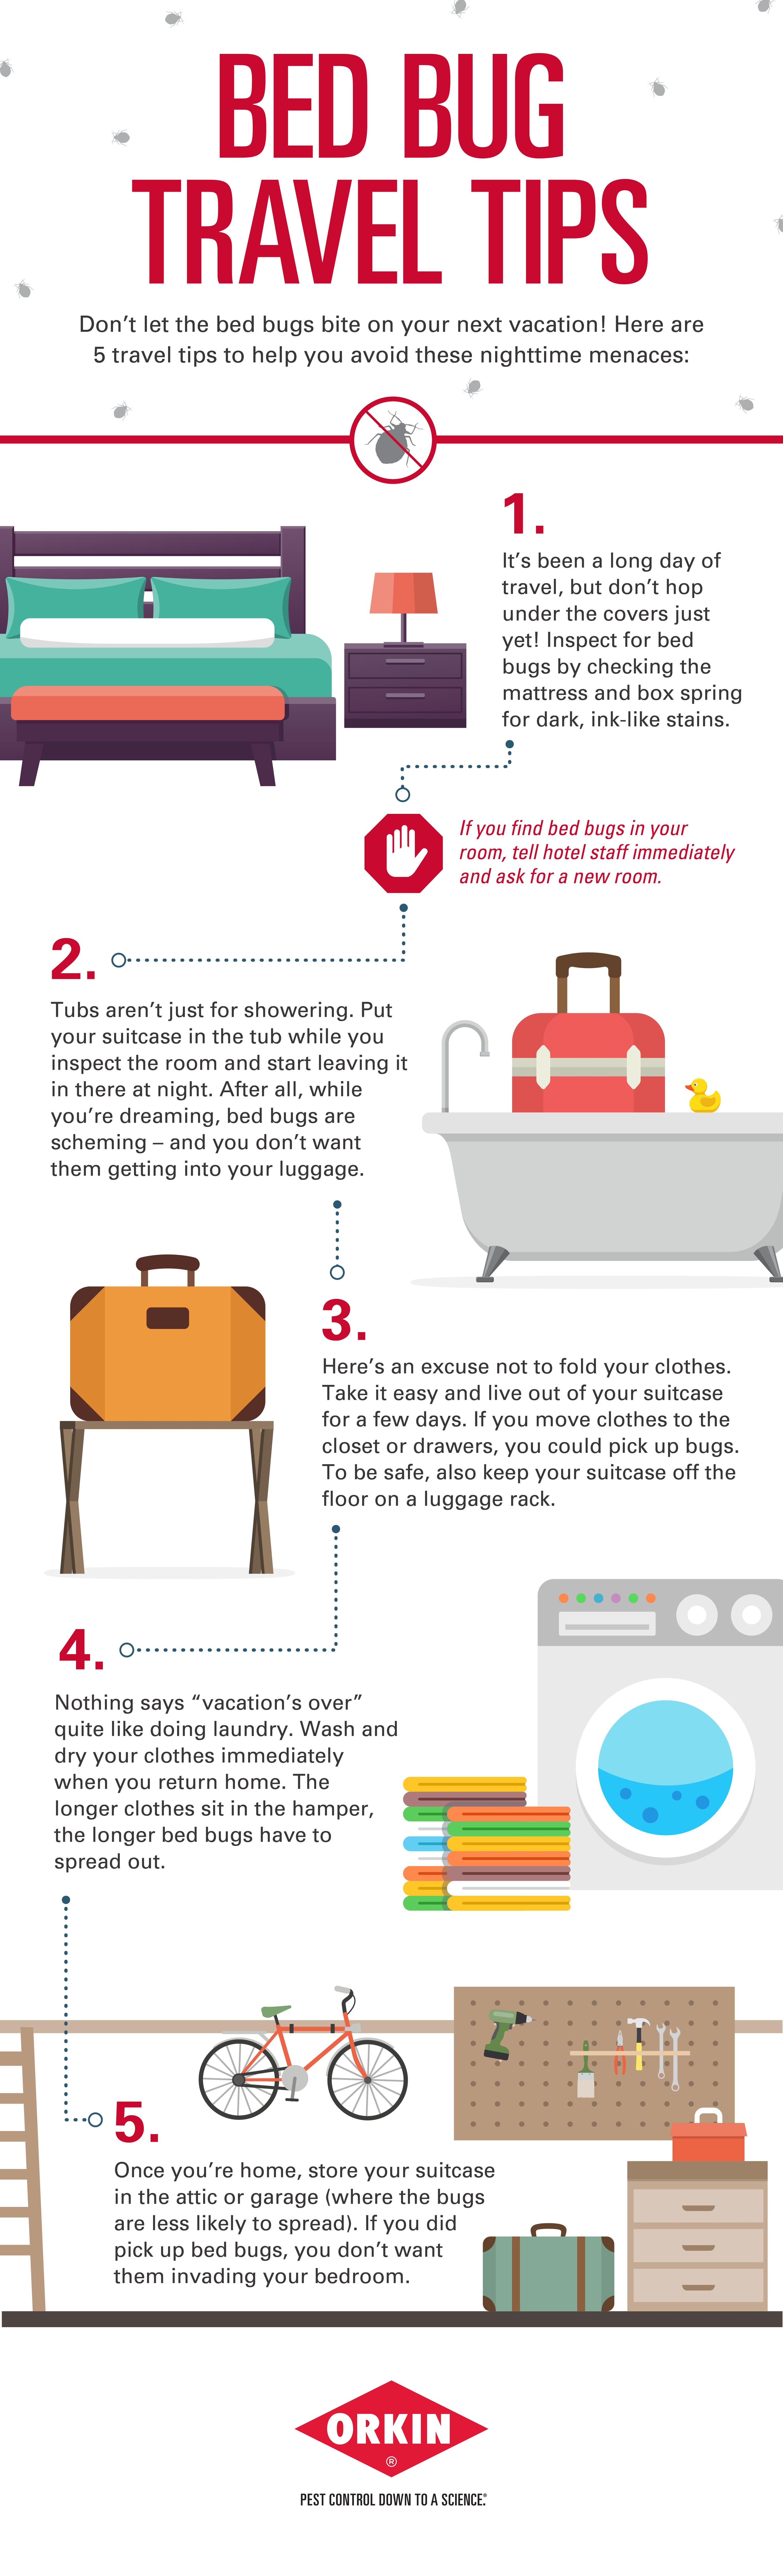 5 Bedbug Travel Tips Learnwithorkin Travel Infographic Travel Tips Bed Bug Travel